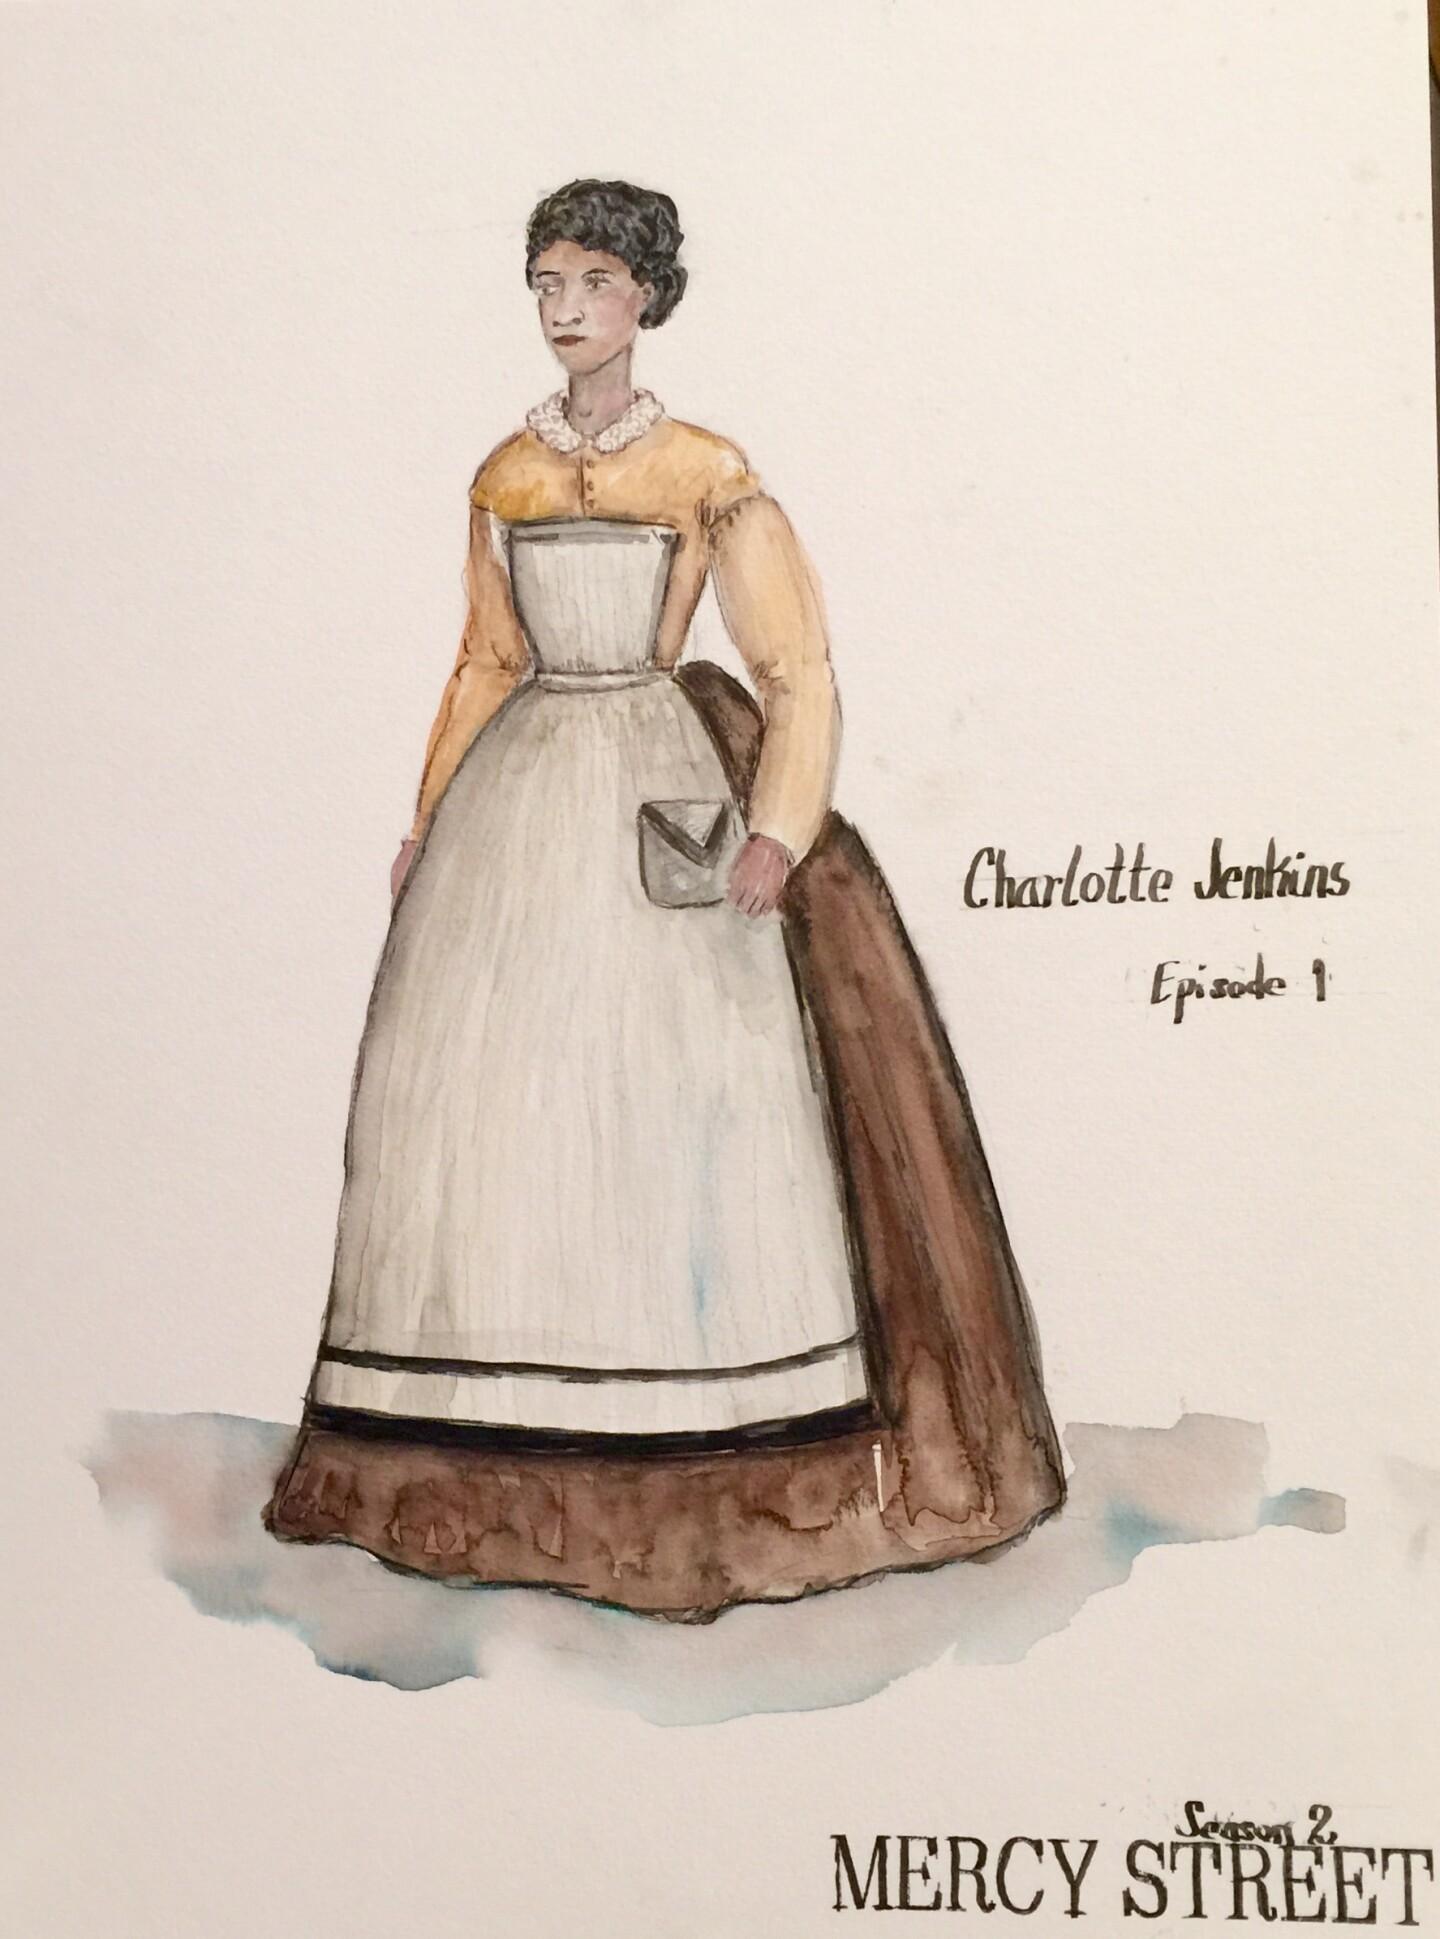 Charlotte Costume - Mercy Street